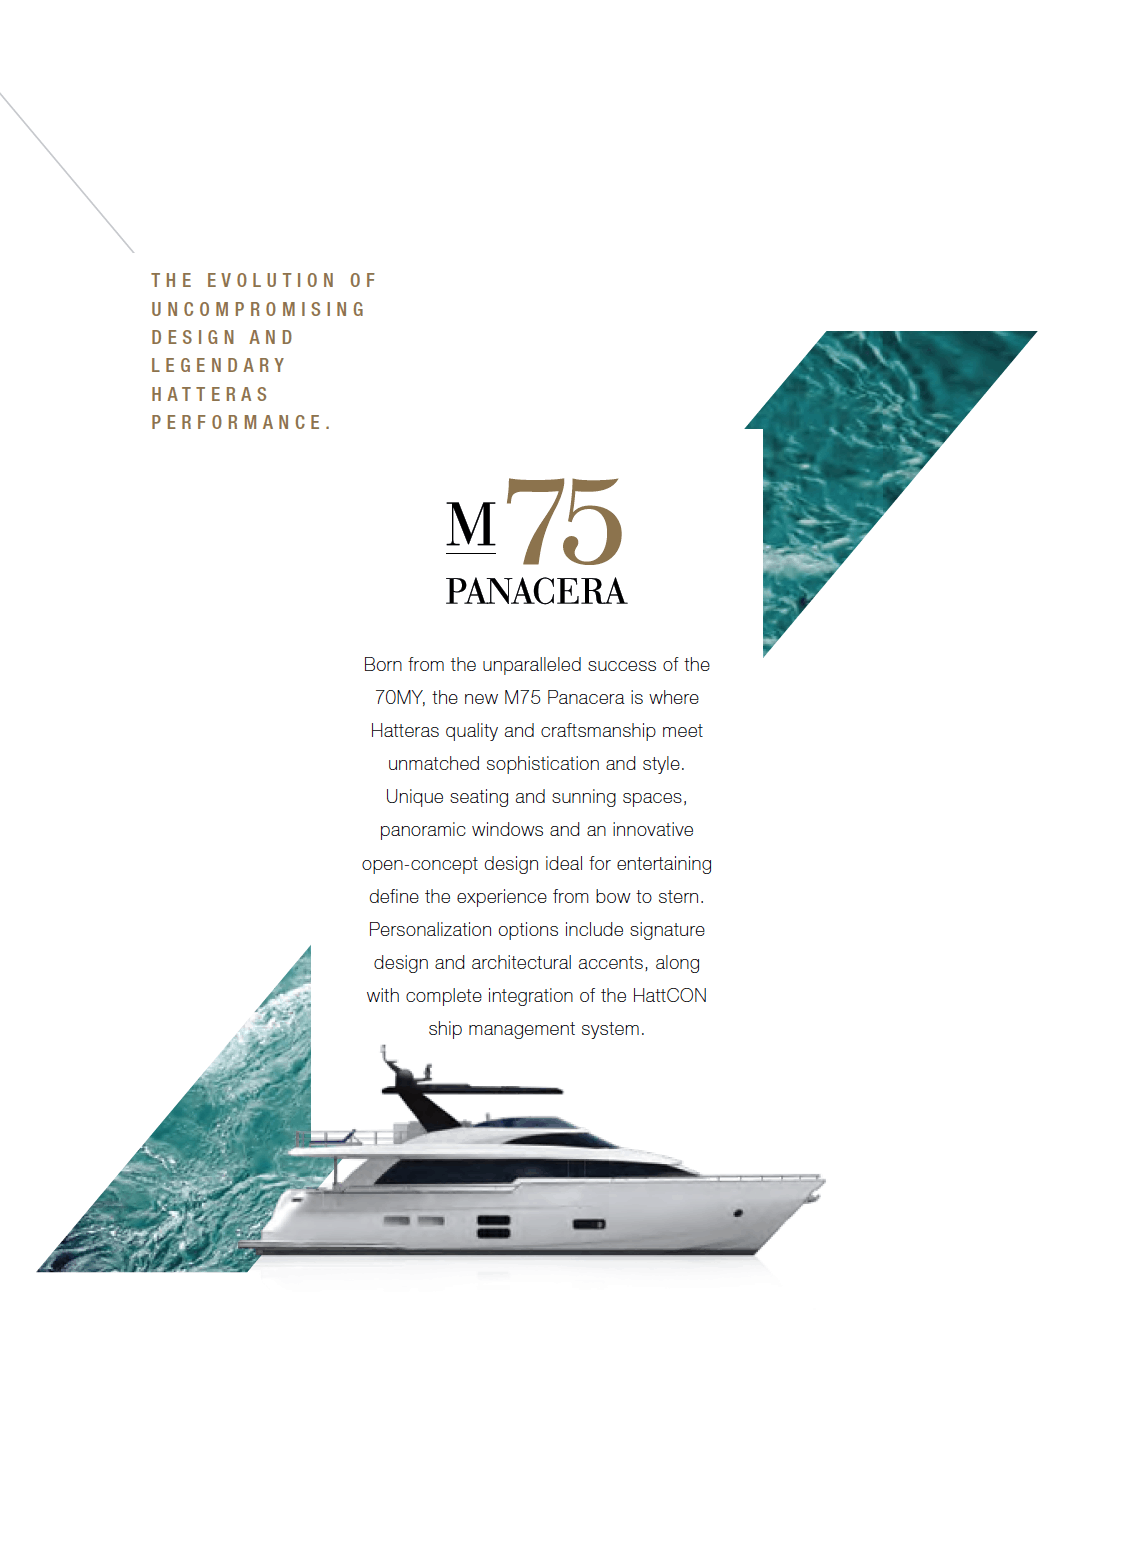 Hatteras M75 Panacera Summary